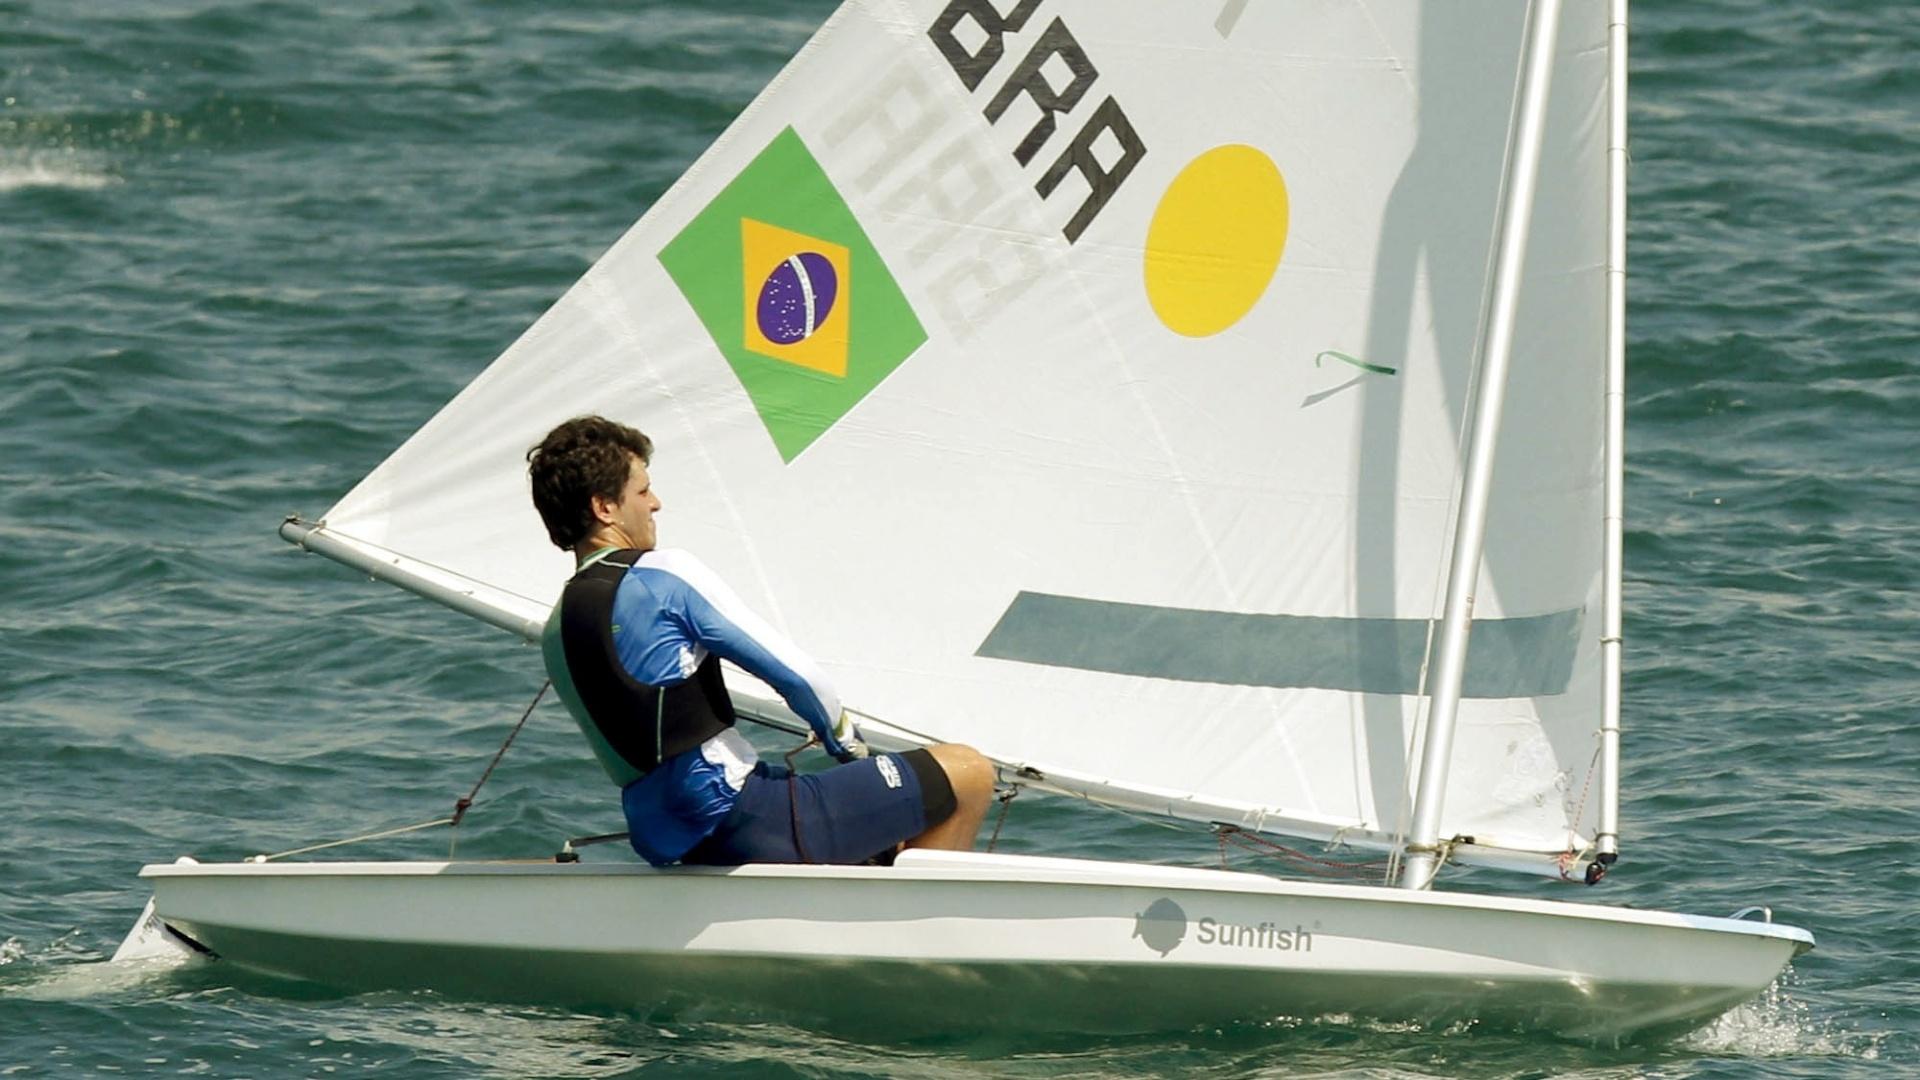 Matheus Dellagnelo vence mais uma regata e fecha segundo dia na liderança da classe sunfish na vela do Pan (18/10/2011)